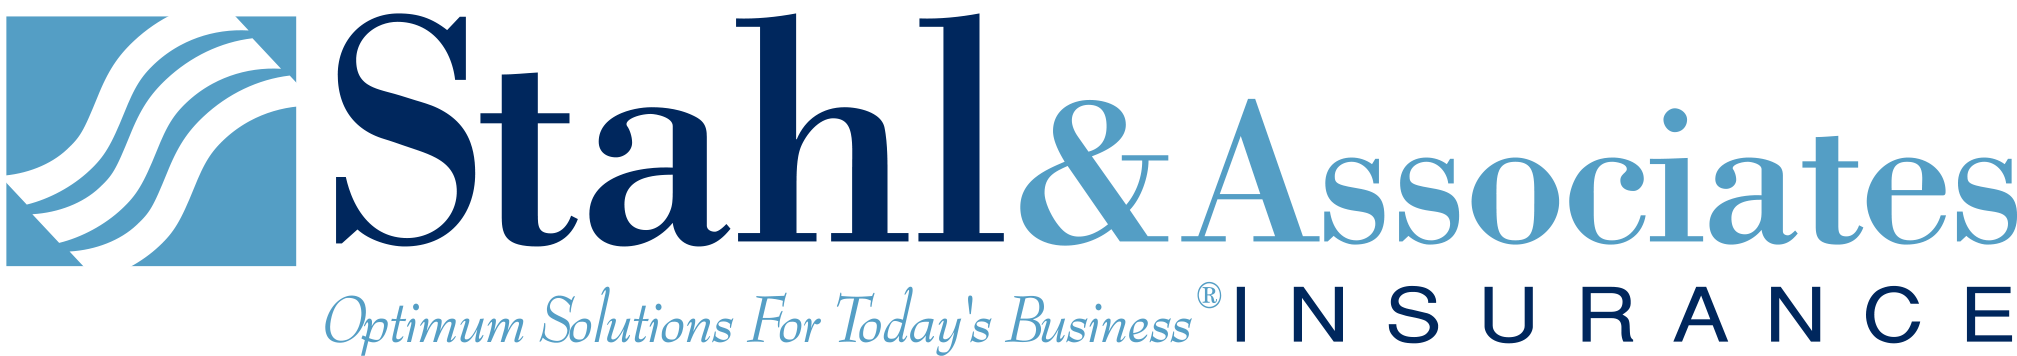 Stahl & Associates Insurance